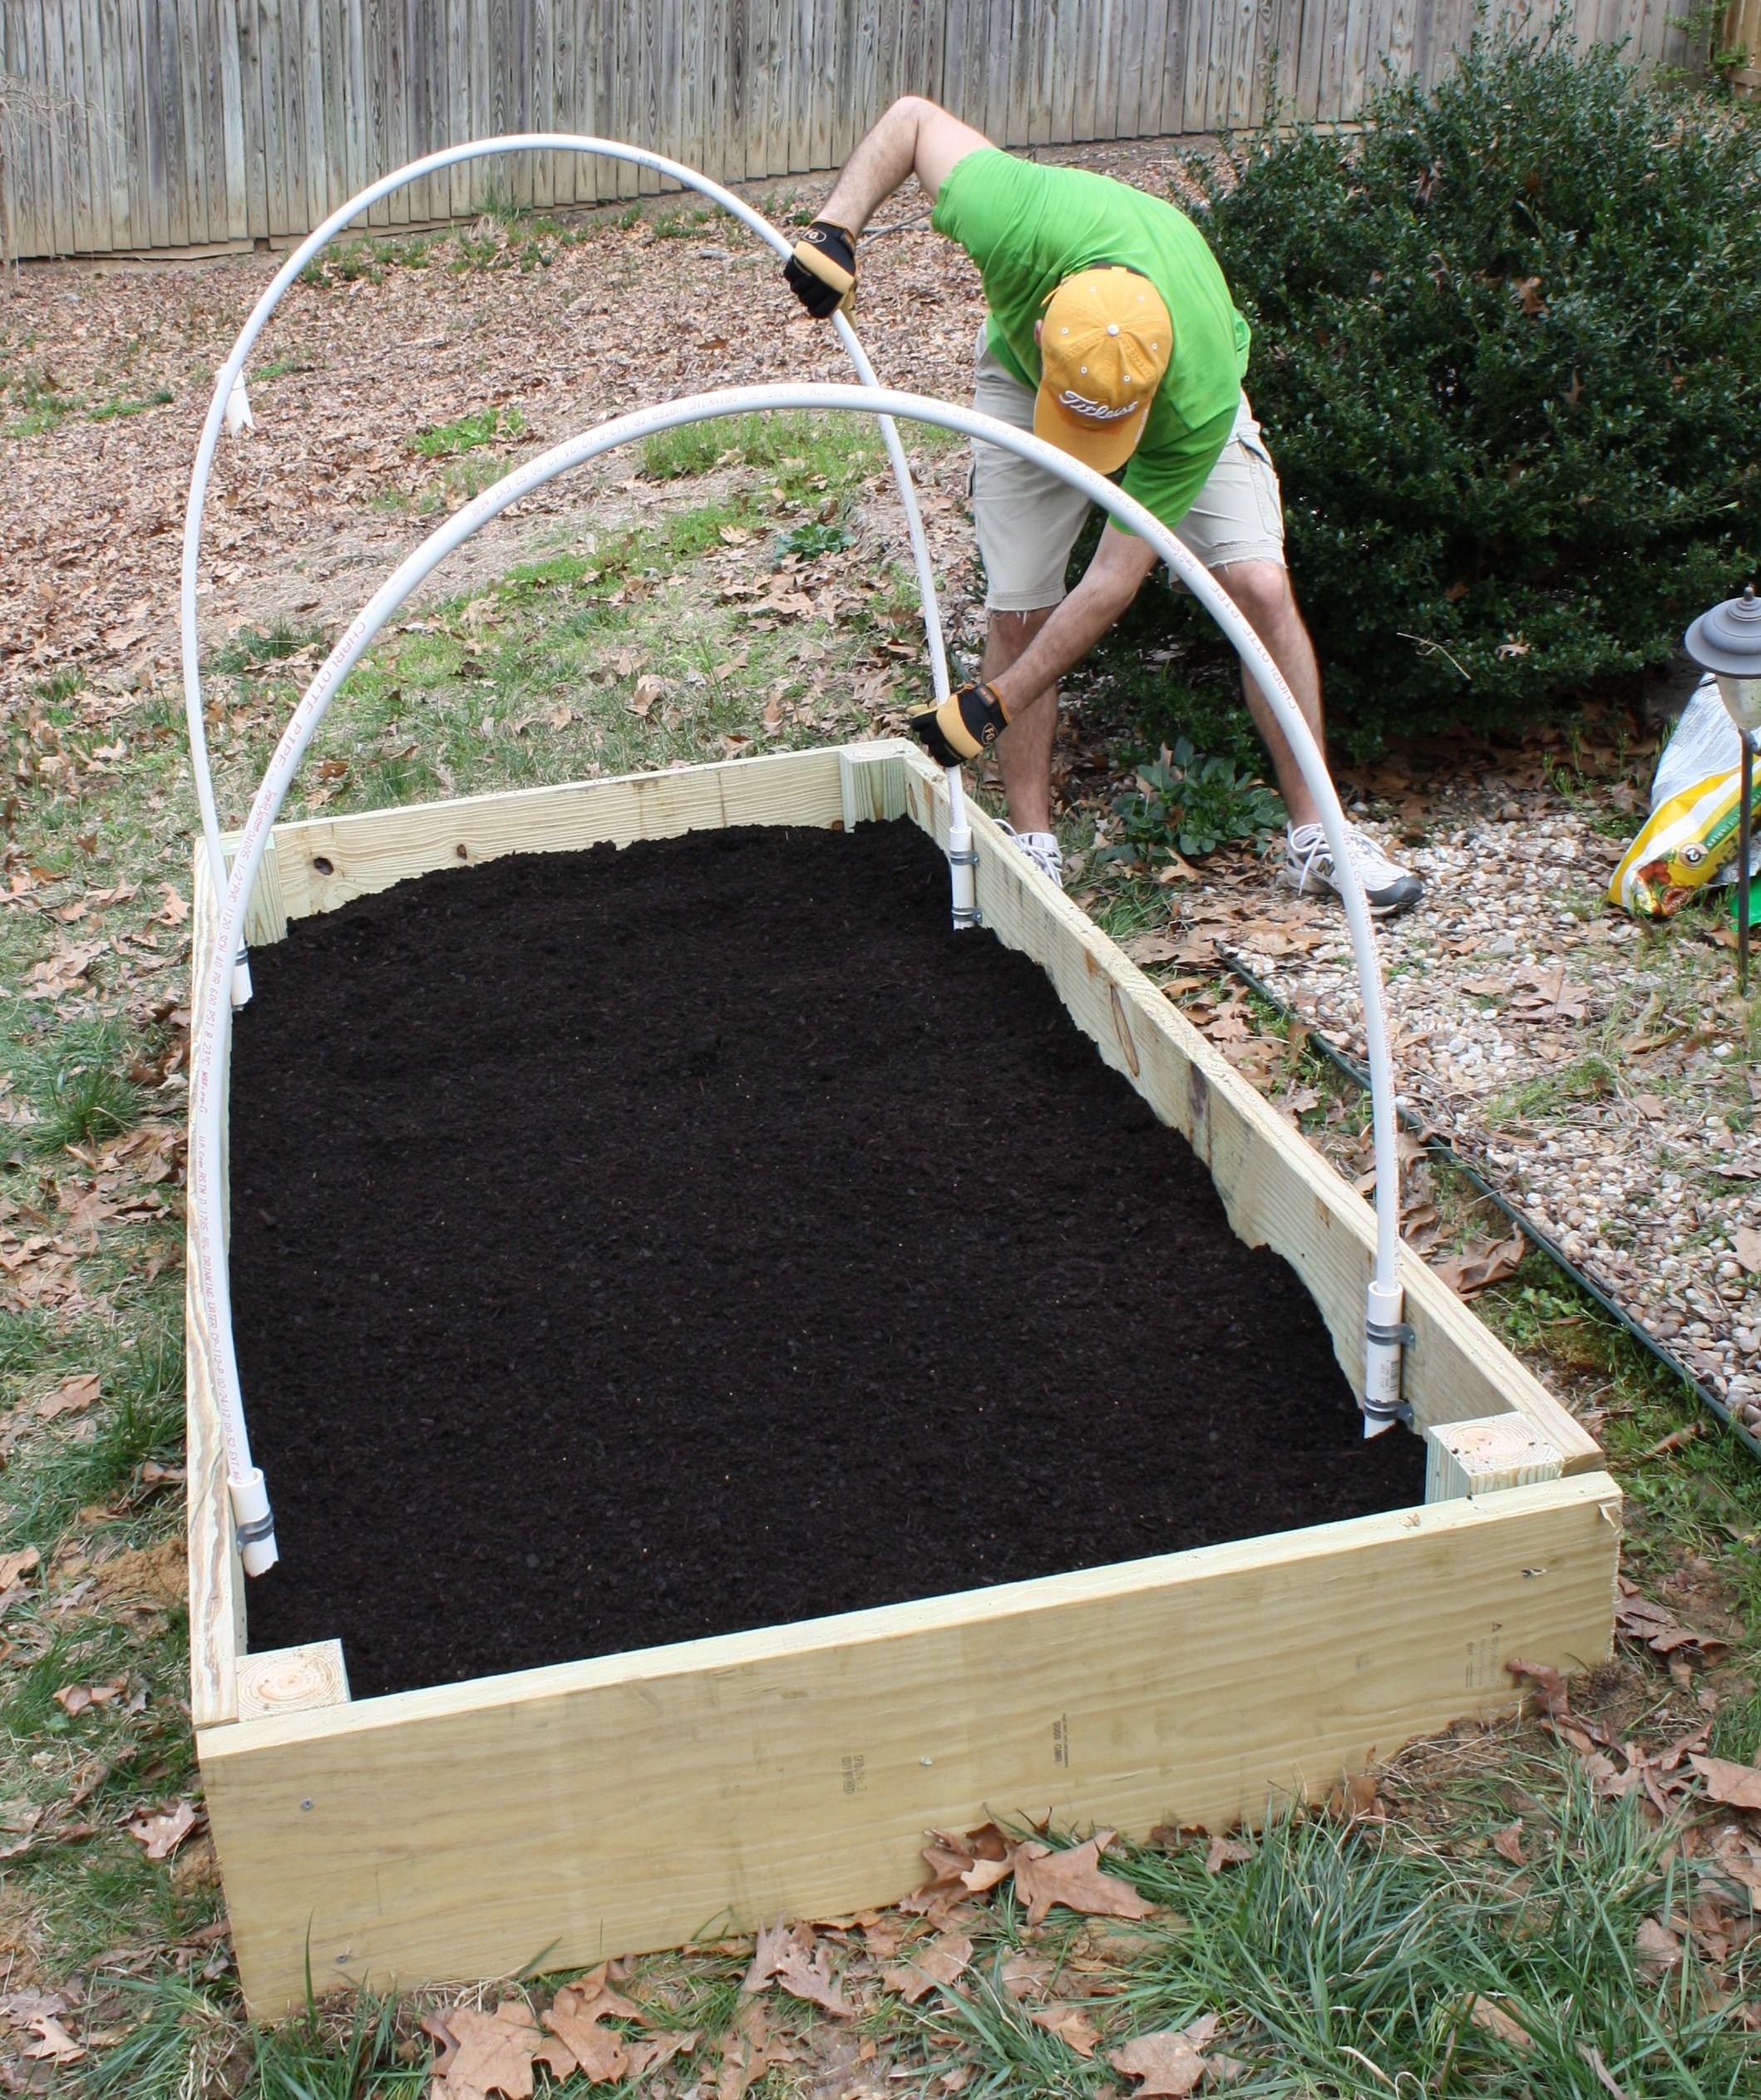 vigoro gro all purpose ip walmart miracle soil cf garden organic com